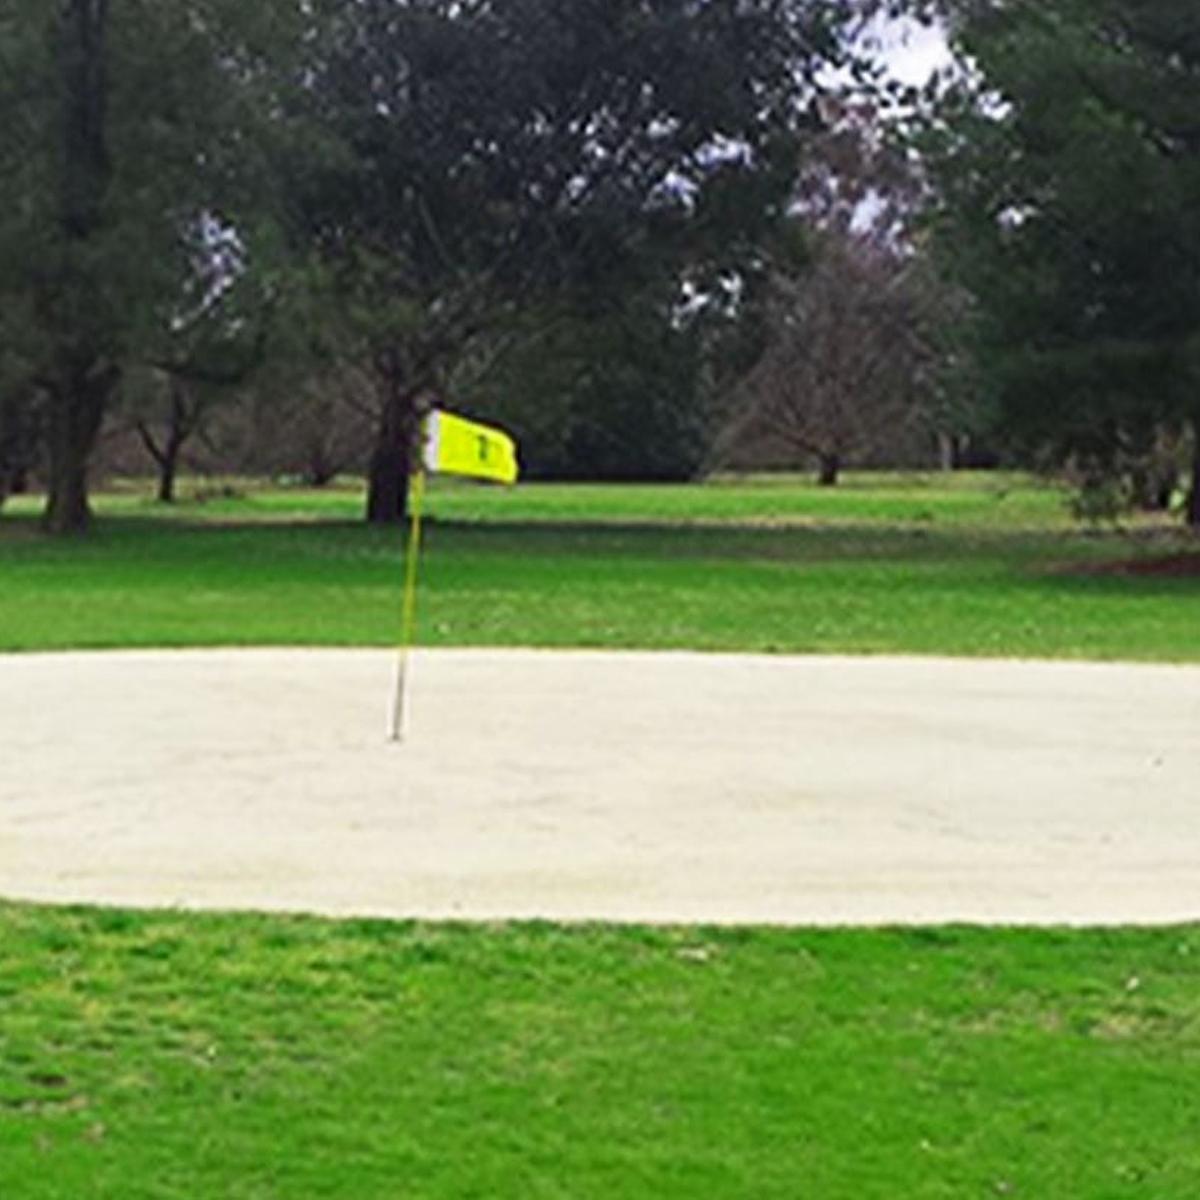 Sand greens at Holbrook Returned Servicemen's Golf Club